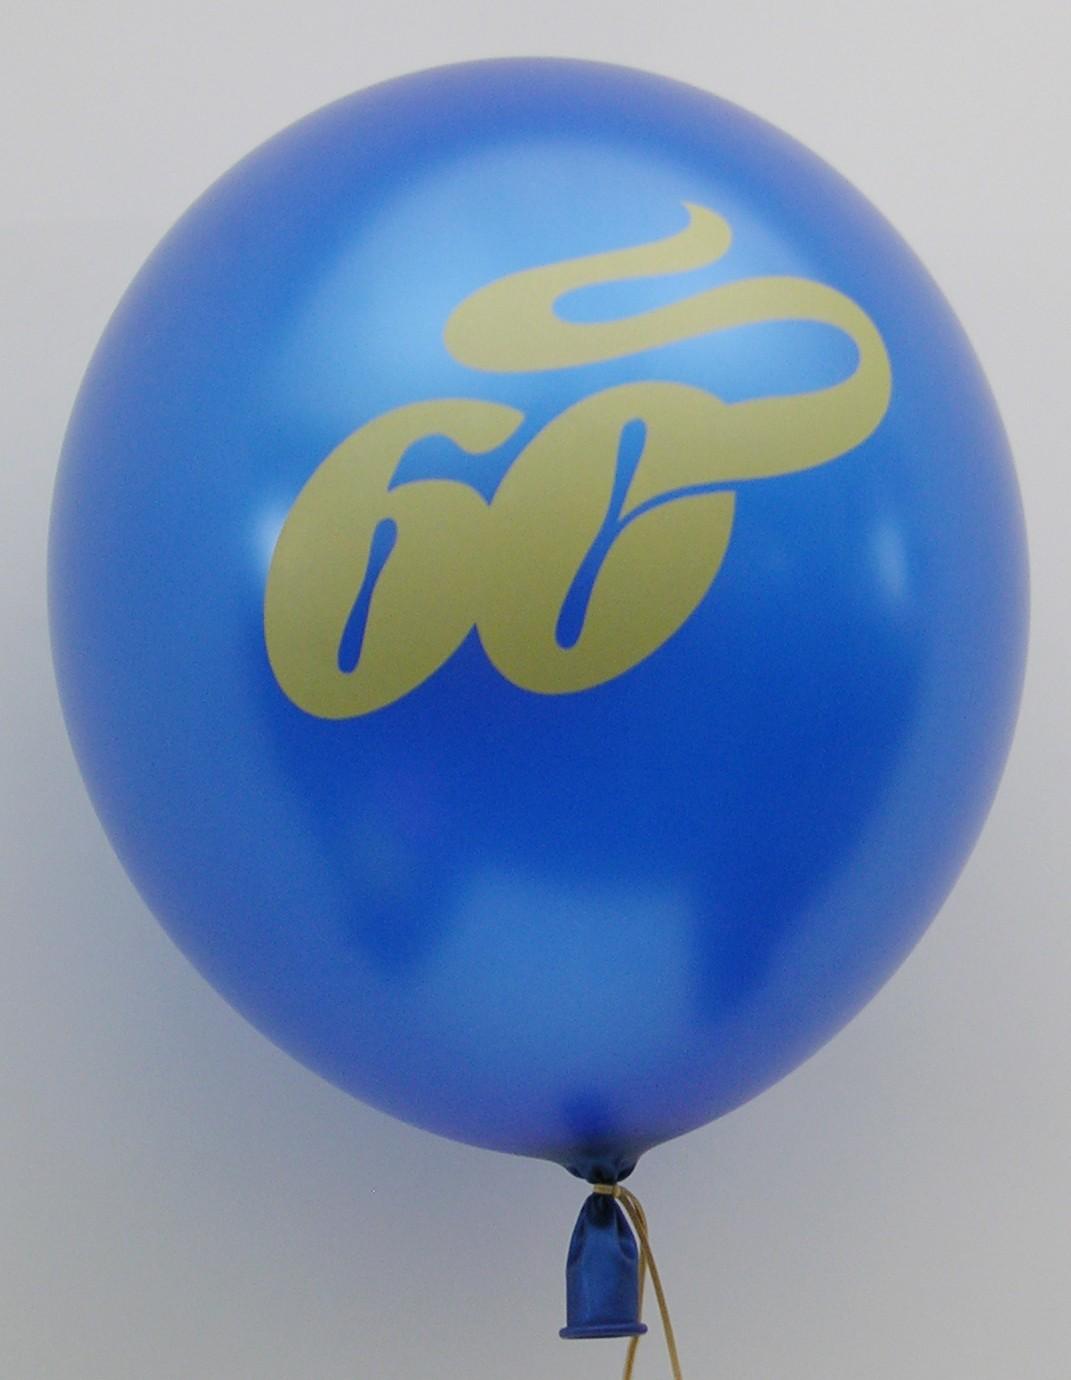 Lufballon mit Logo